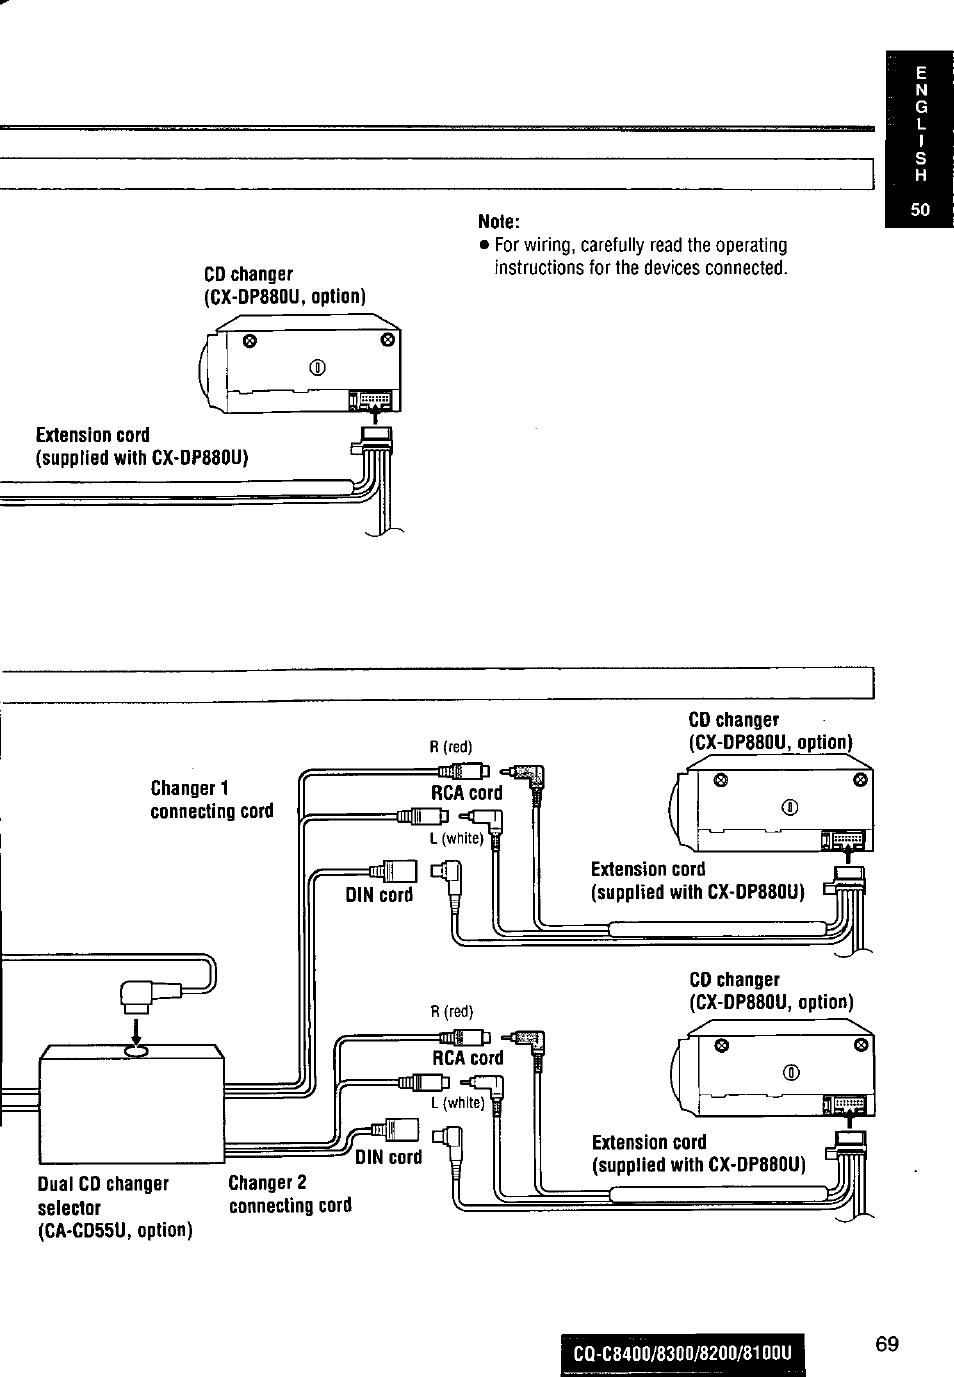 hight resolution of panasonic cq c8300u user manual page 69 176 also for cq c8100u cq c8400 cq c8200